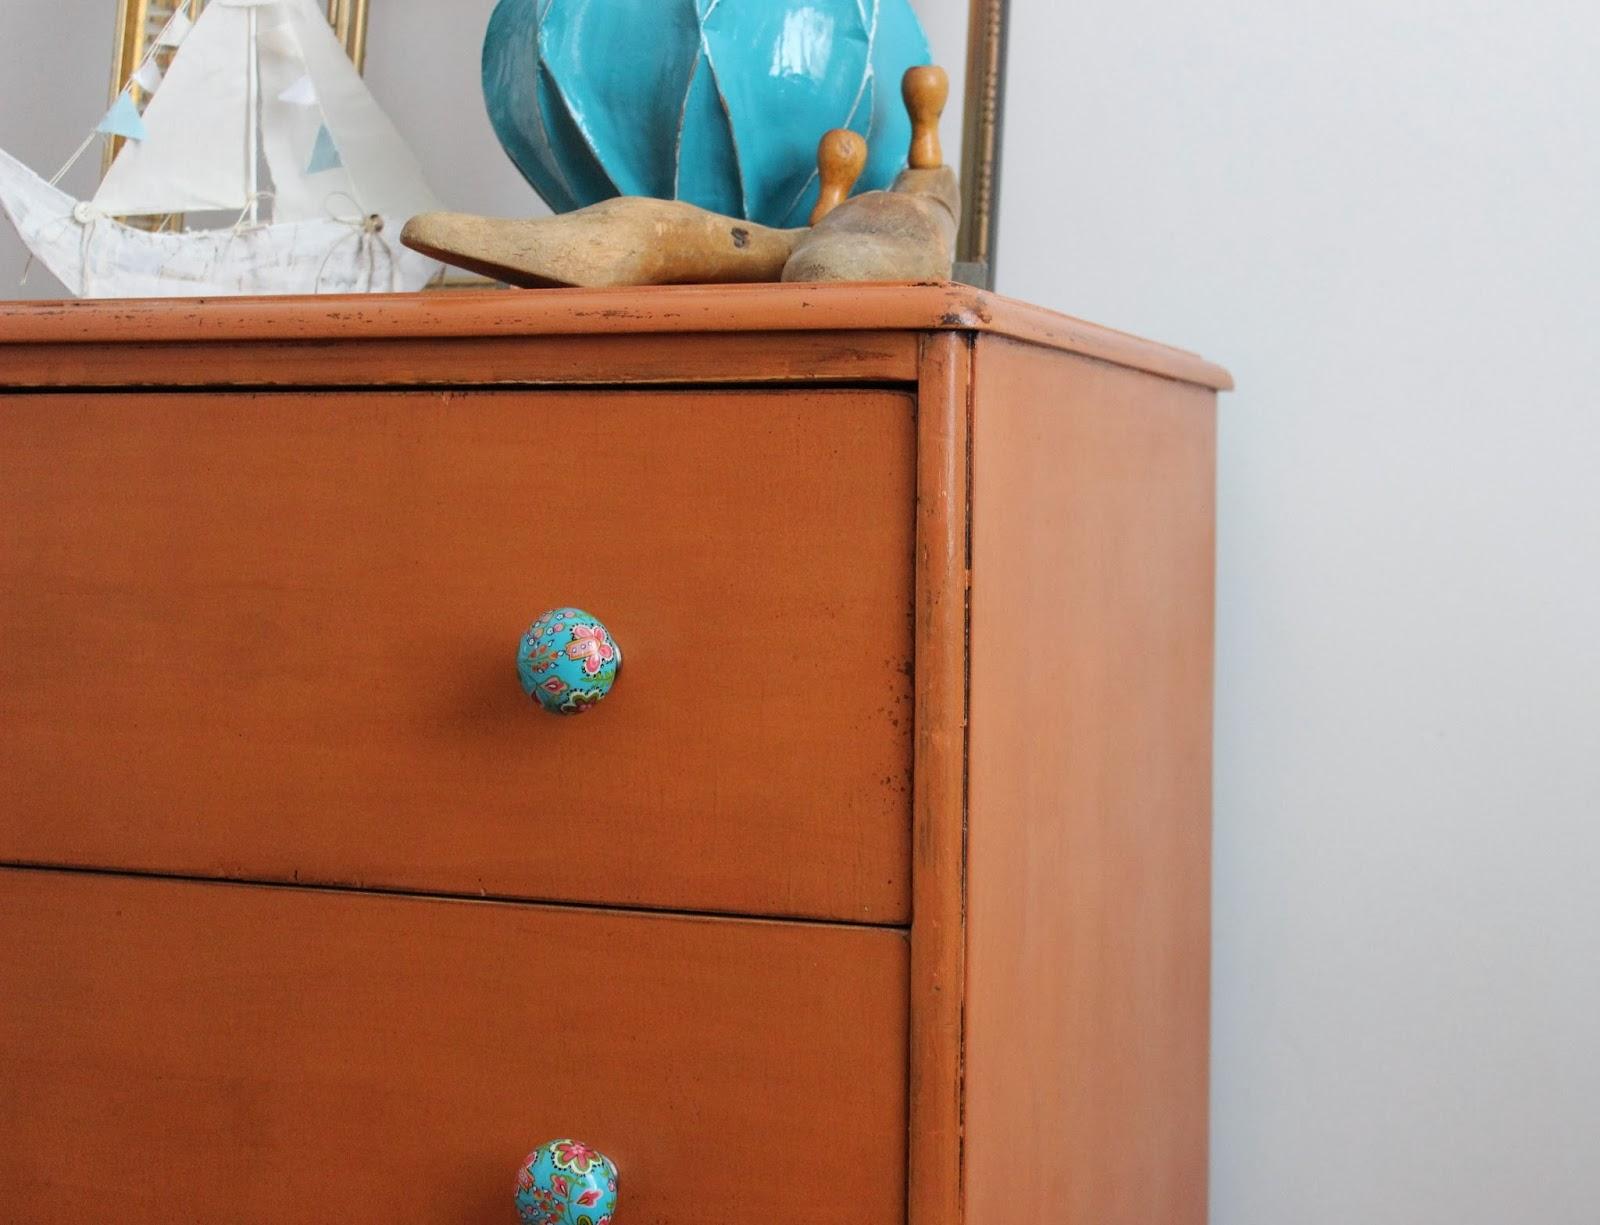 Pumpkin Orange Paint poppyseed creative living: pumpkin orange dresser